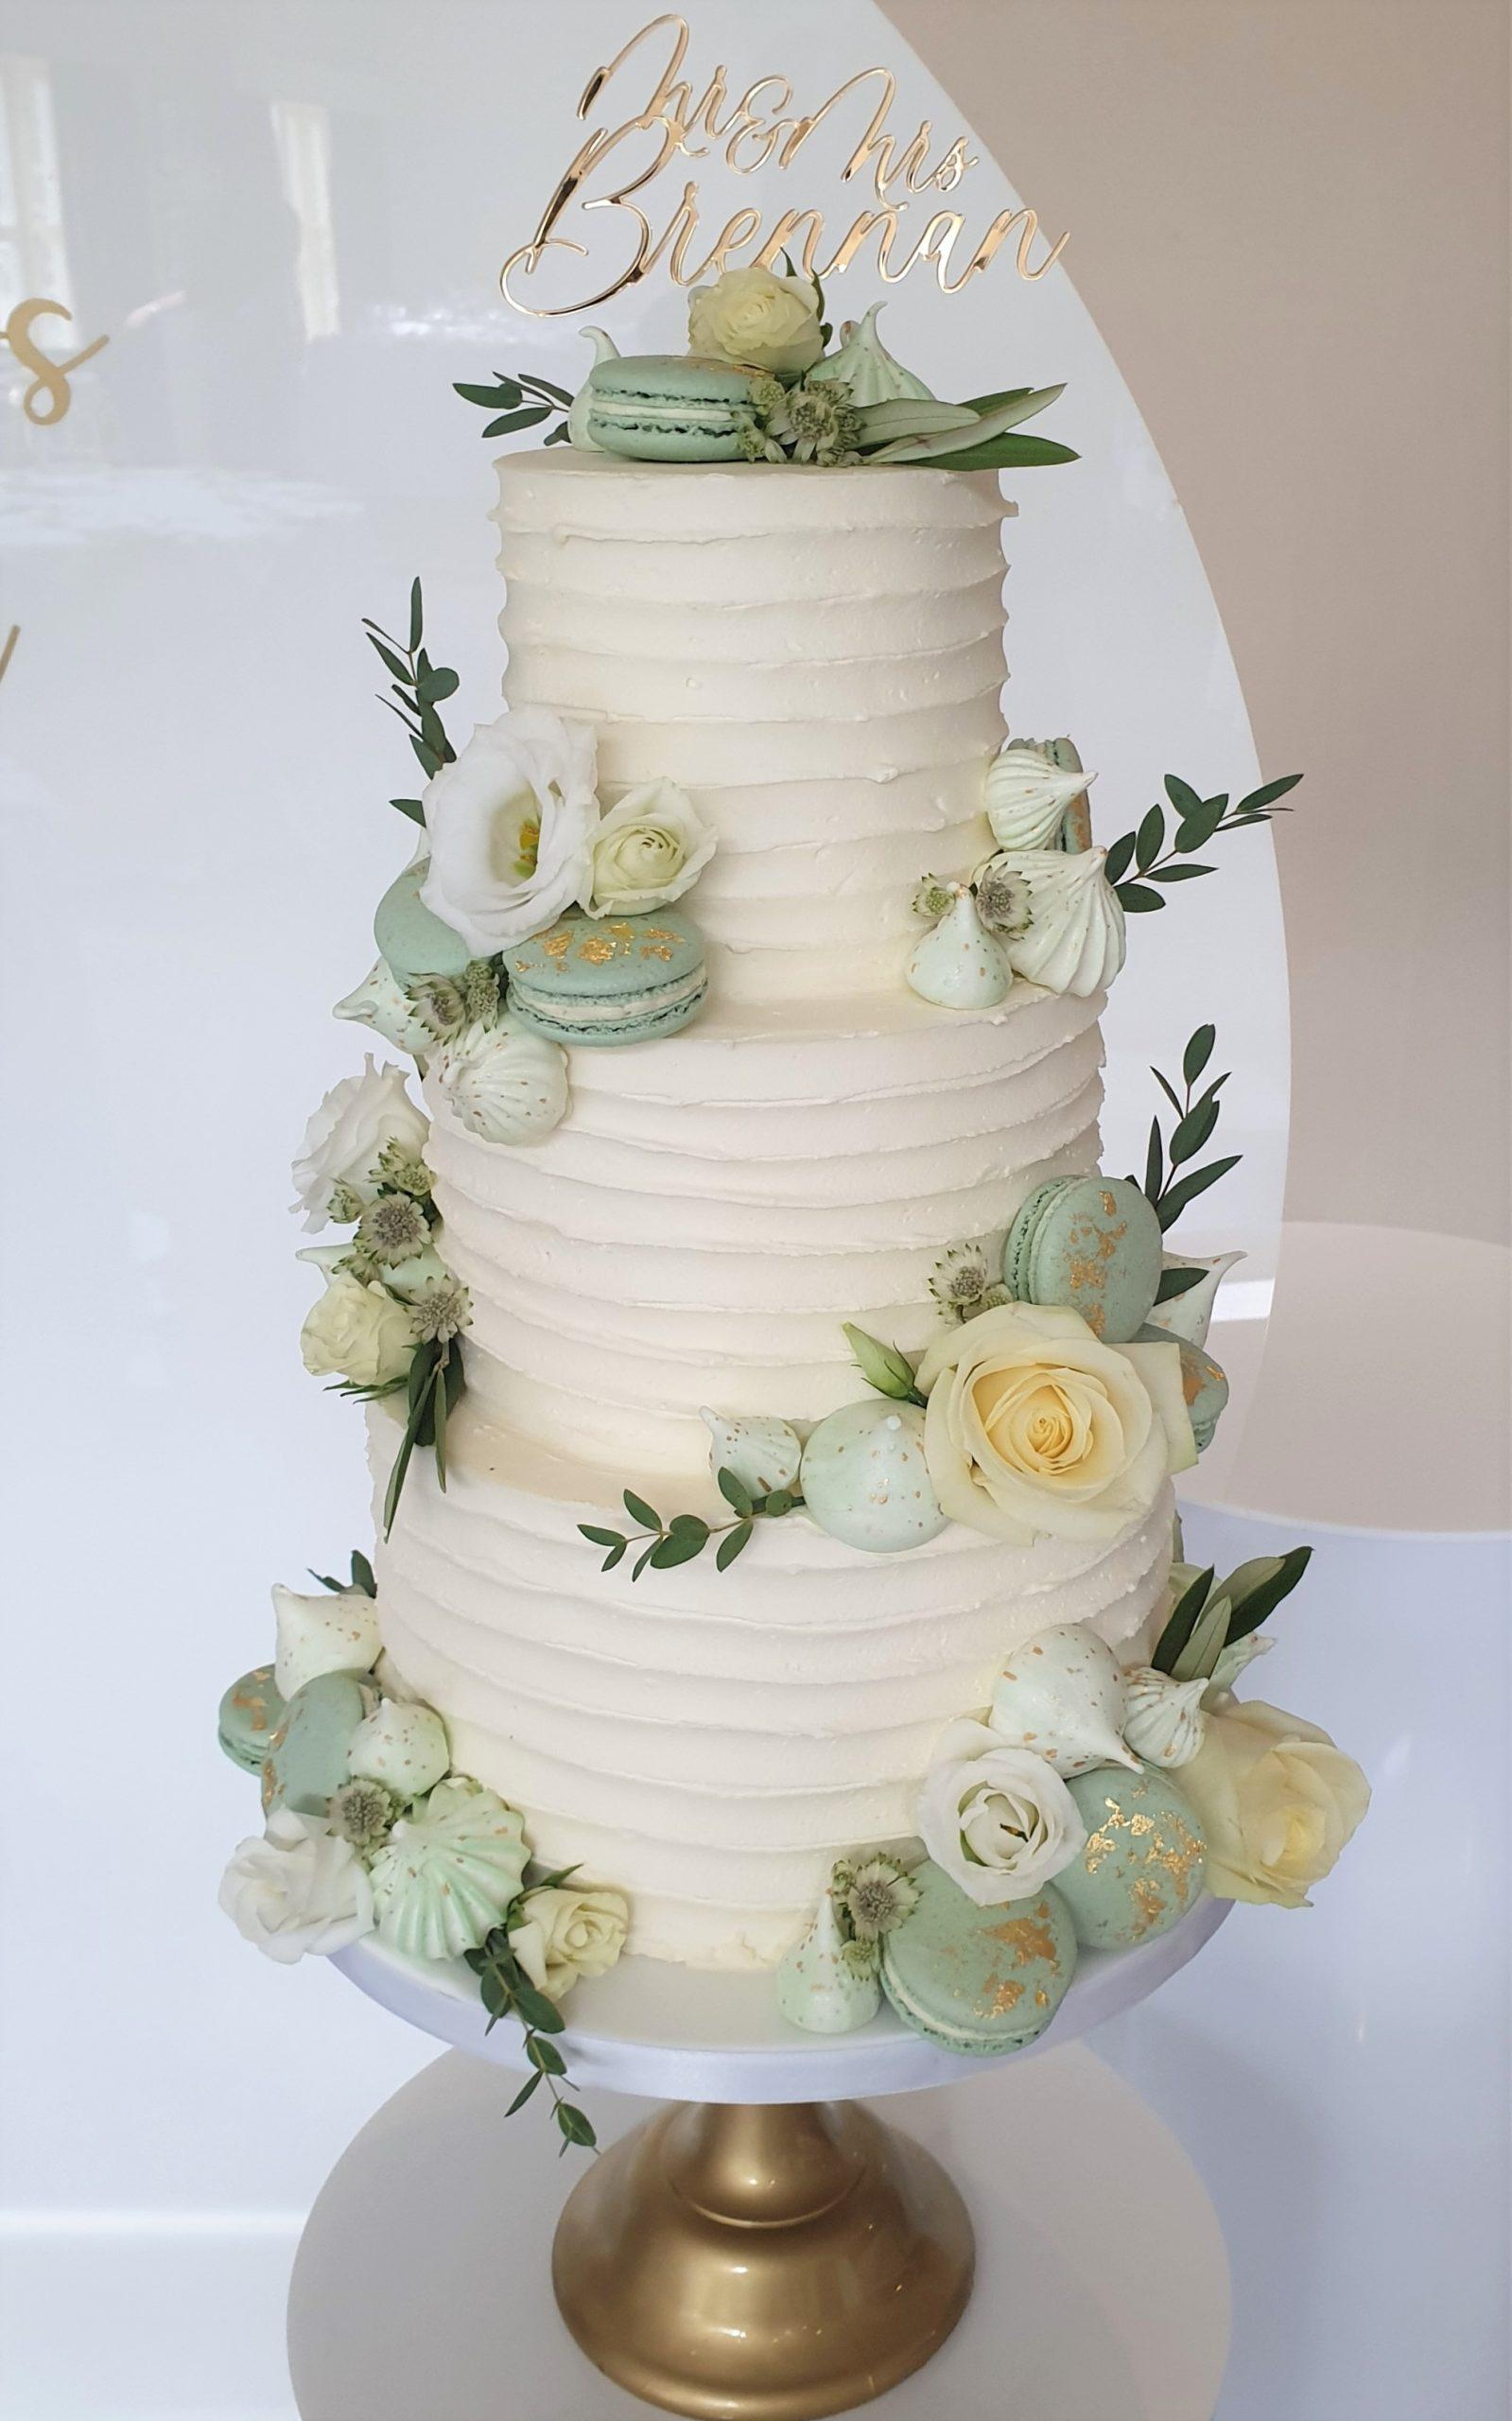 Buttercream Wedding Cake with Meringues Macarons Sage green mint green wedding Prested Hall Essex Wedding Cake